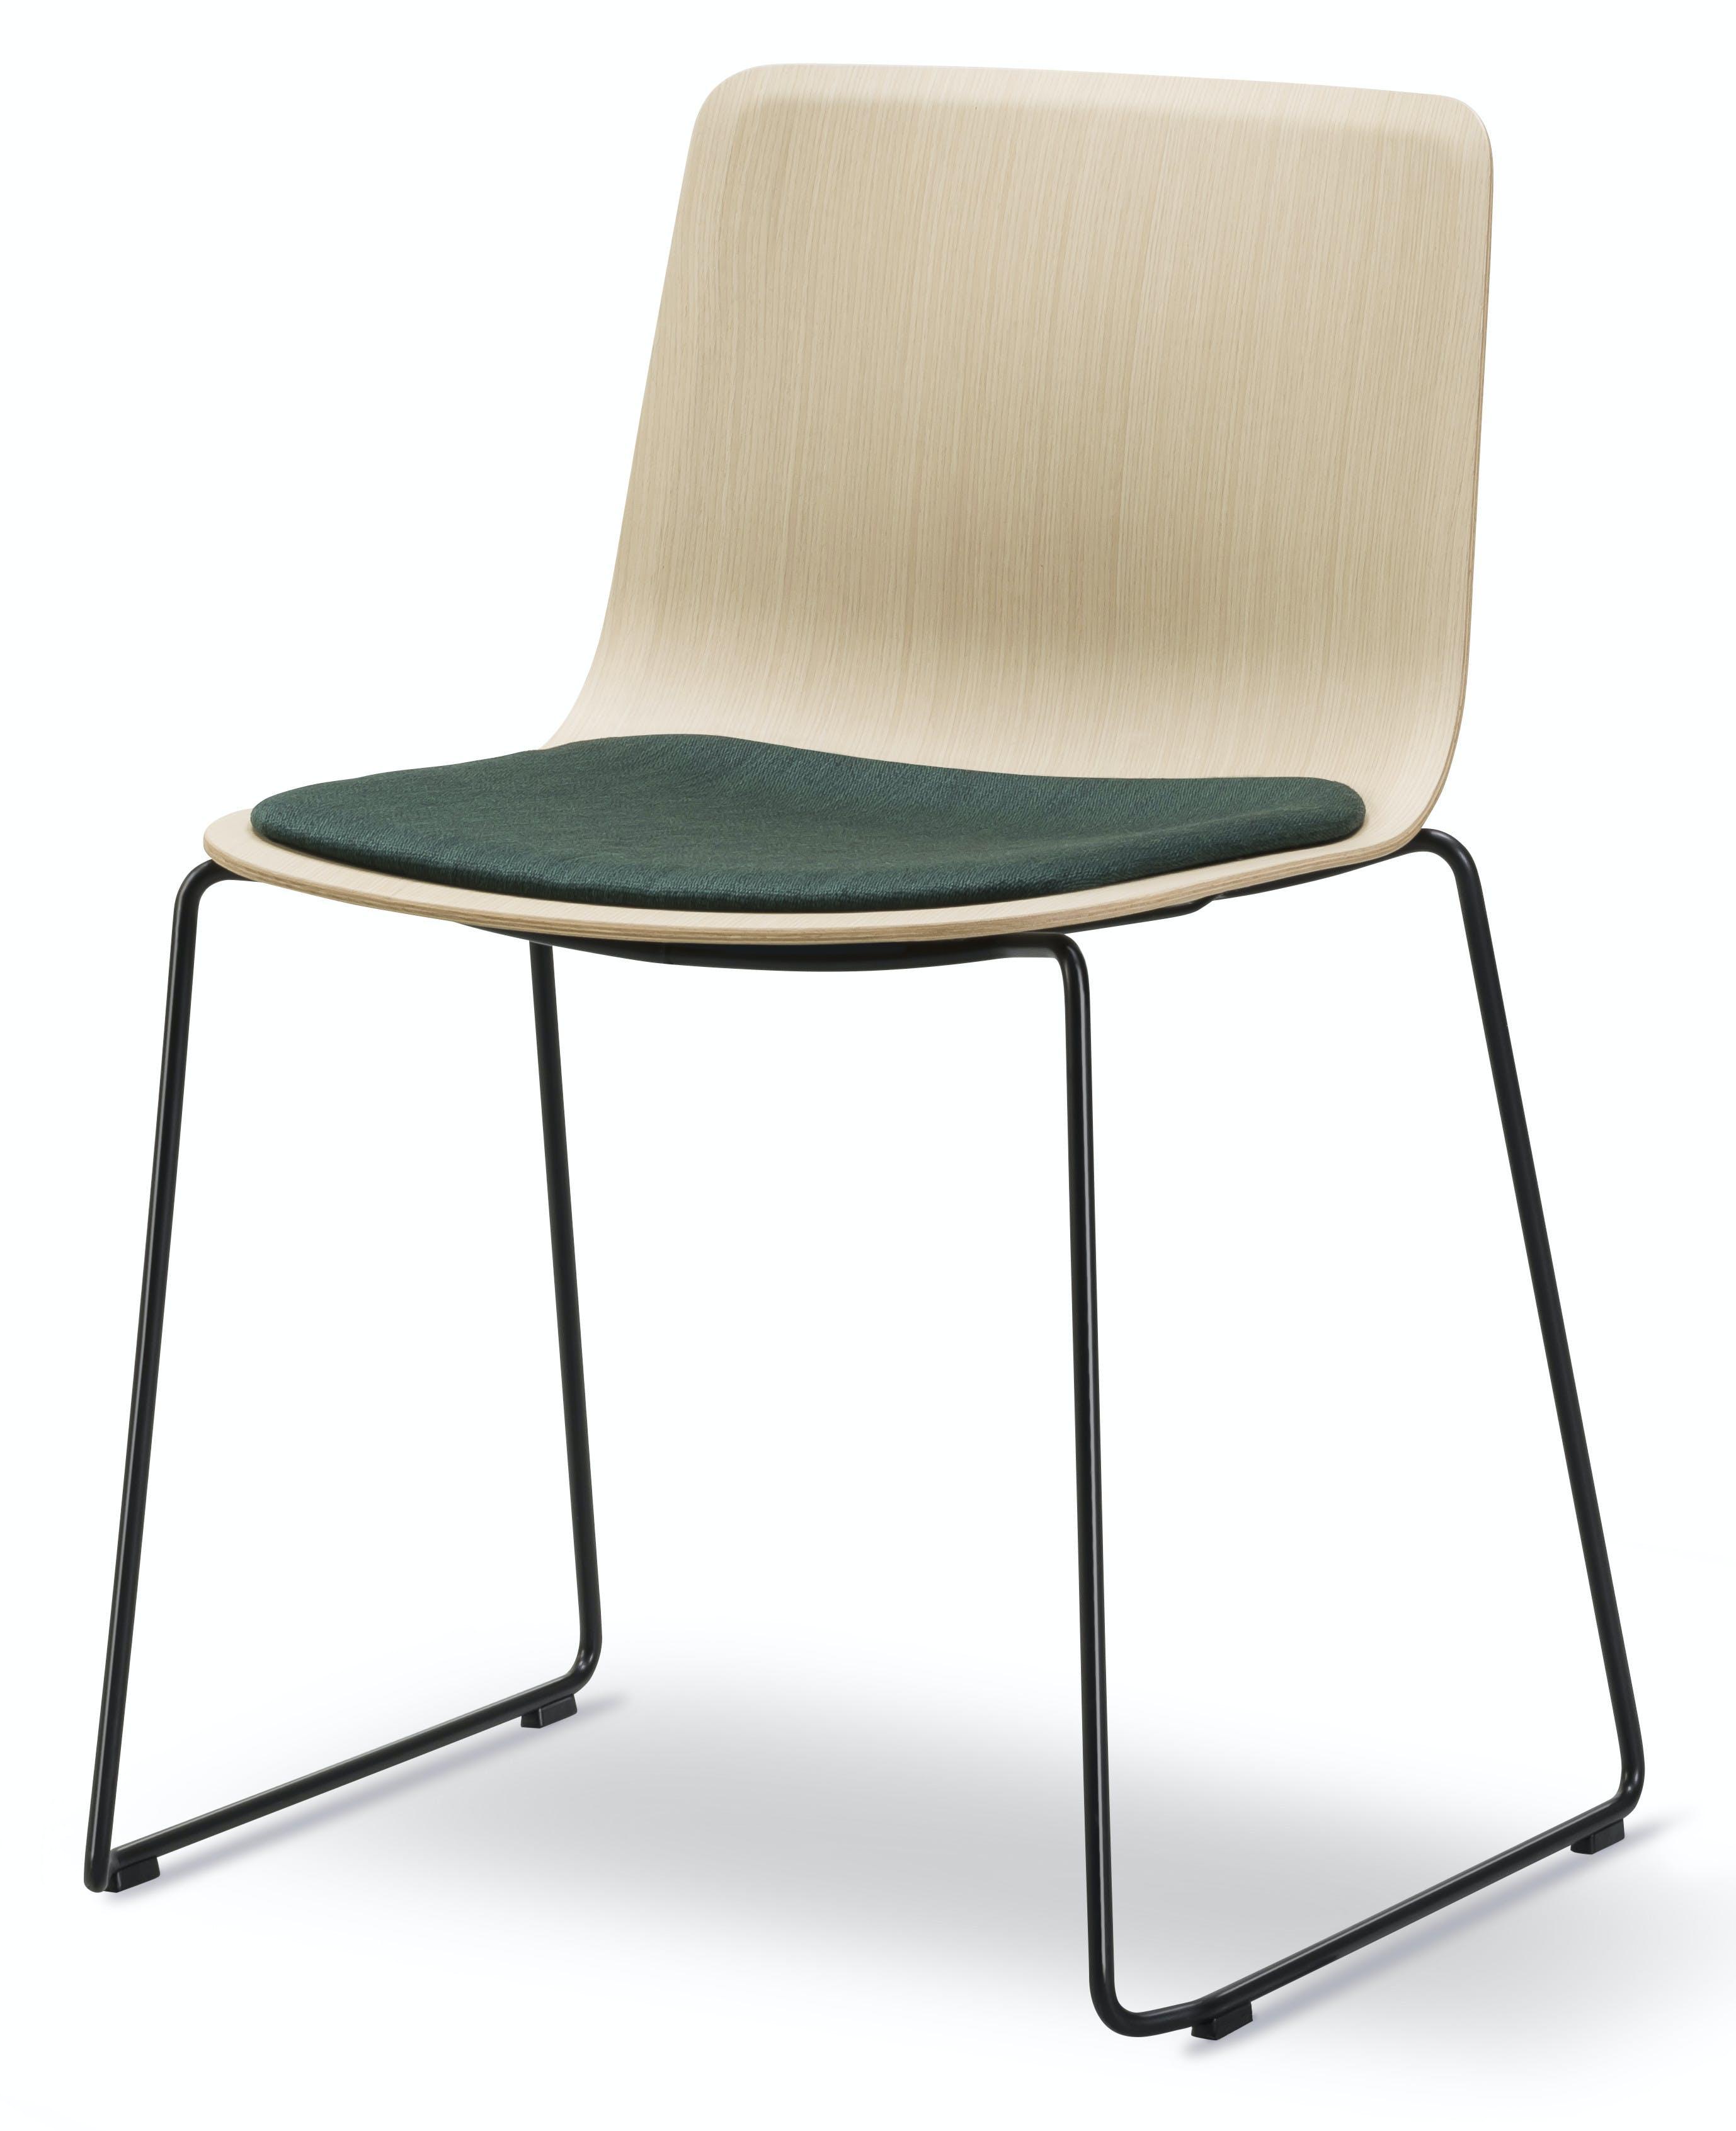 Fredericia Pato Sledge Chair Veneer Angle Haute Living